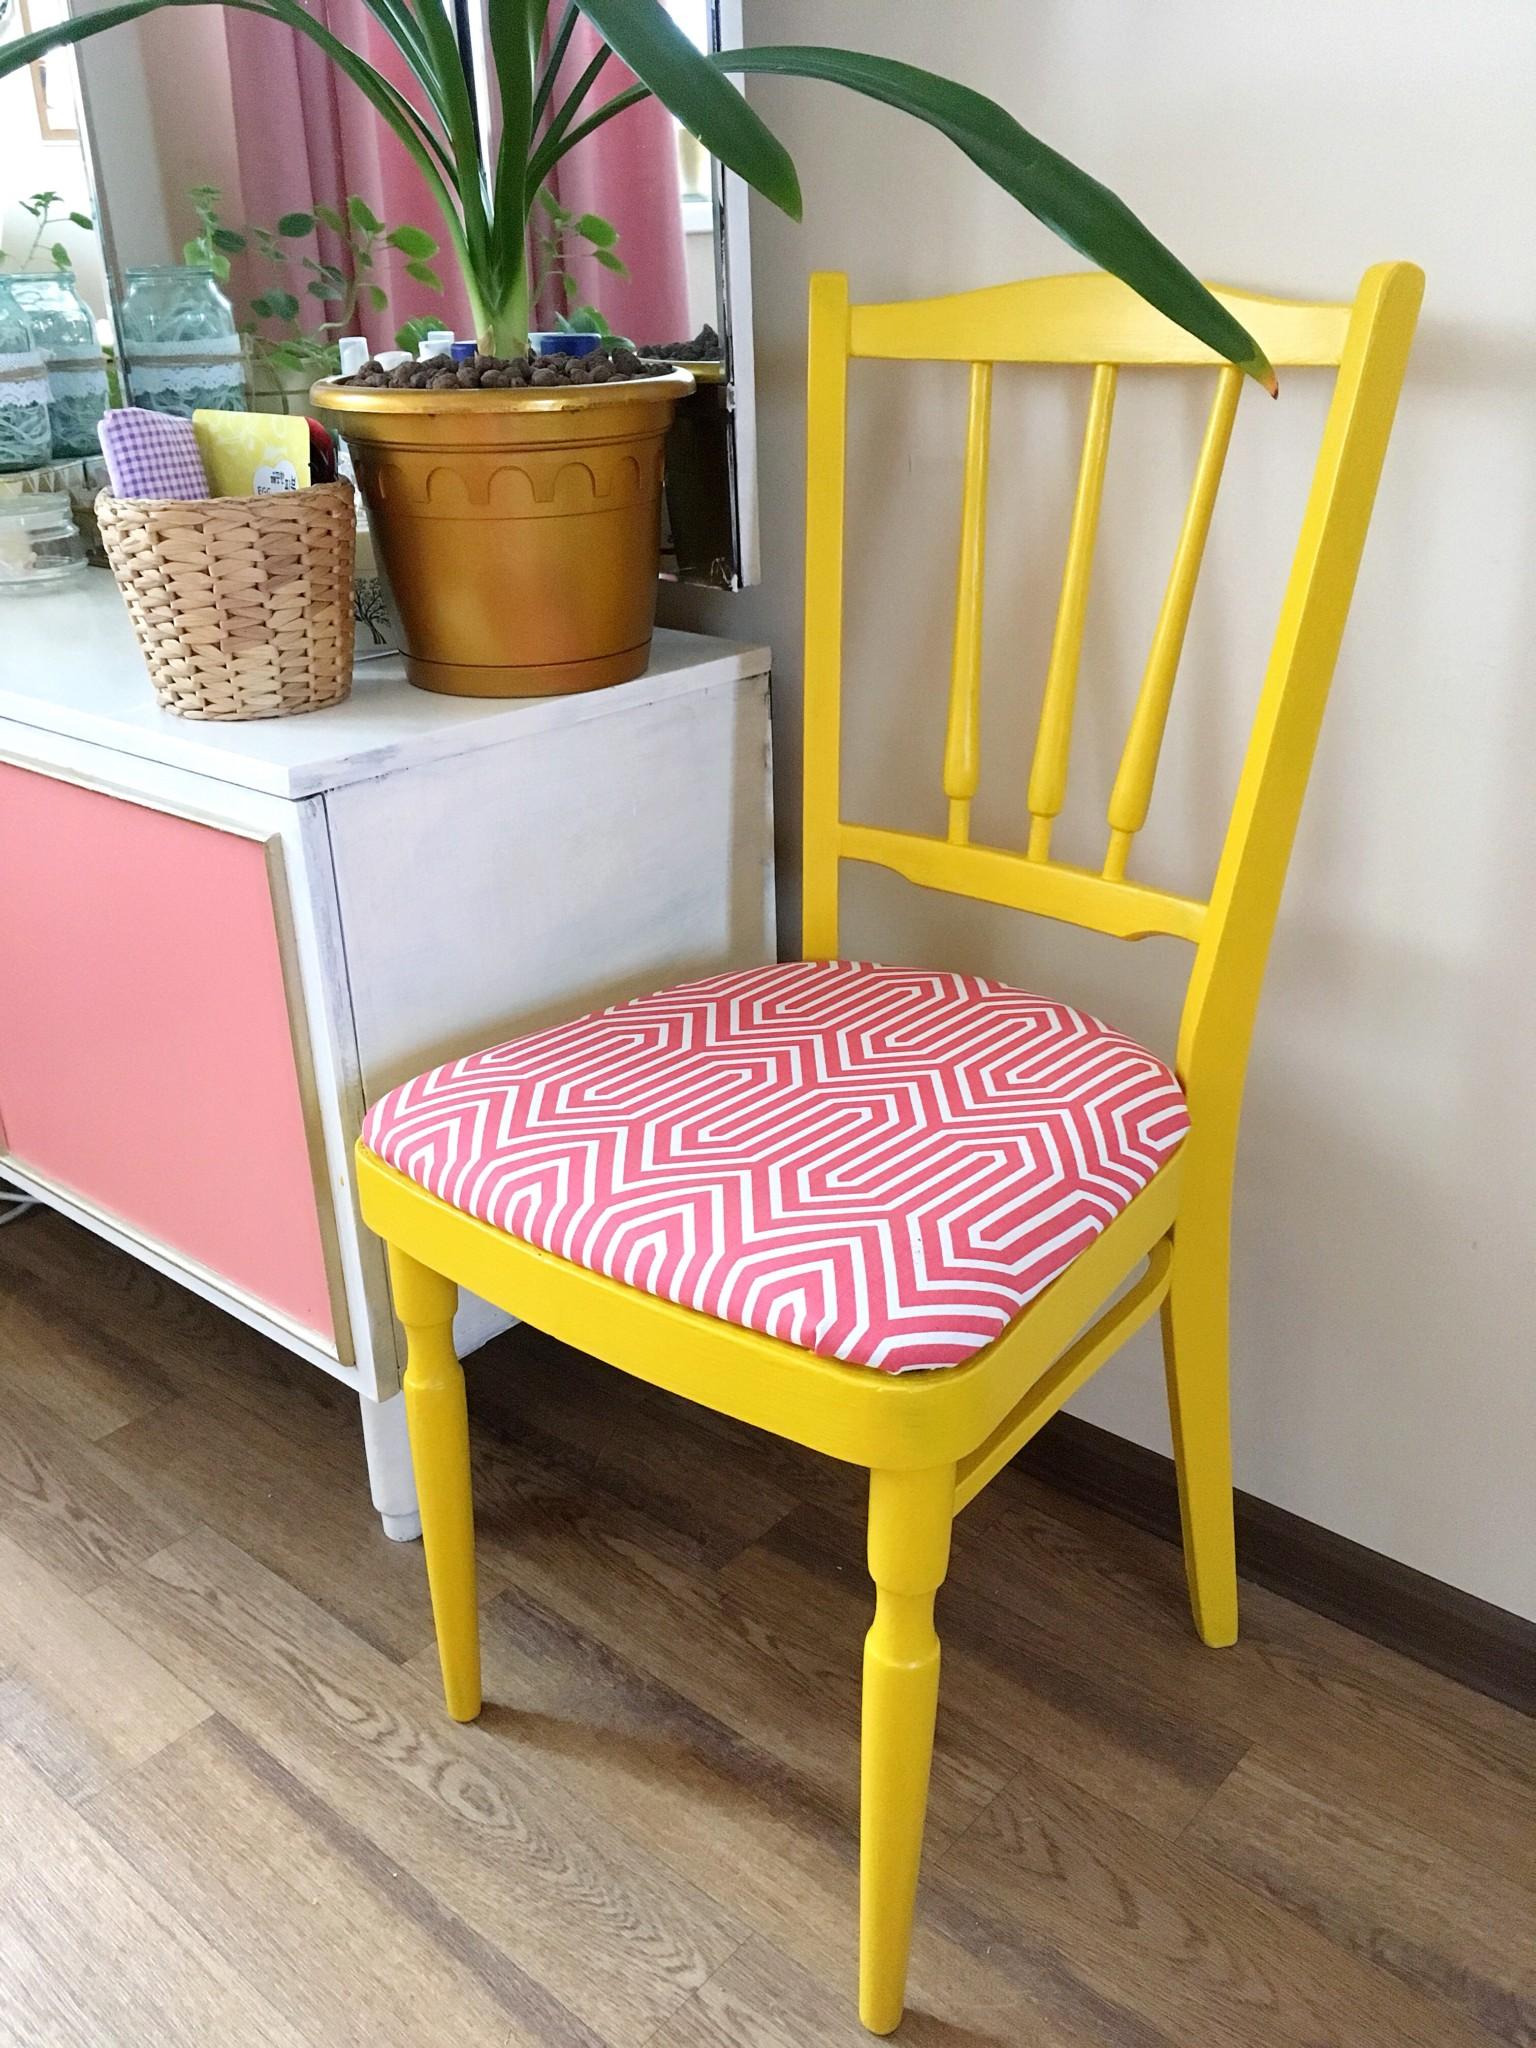 Реставрация стульев в домашних условиях фото